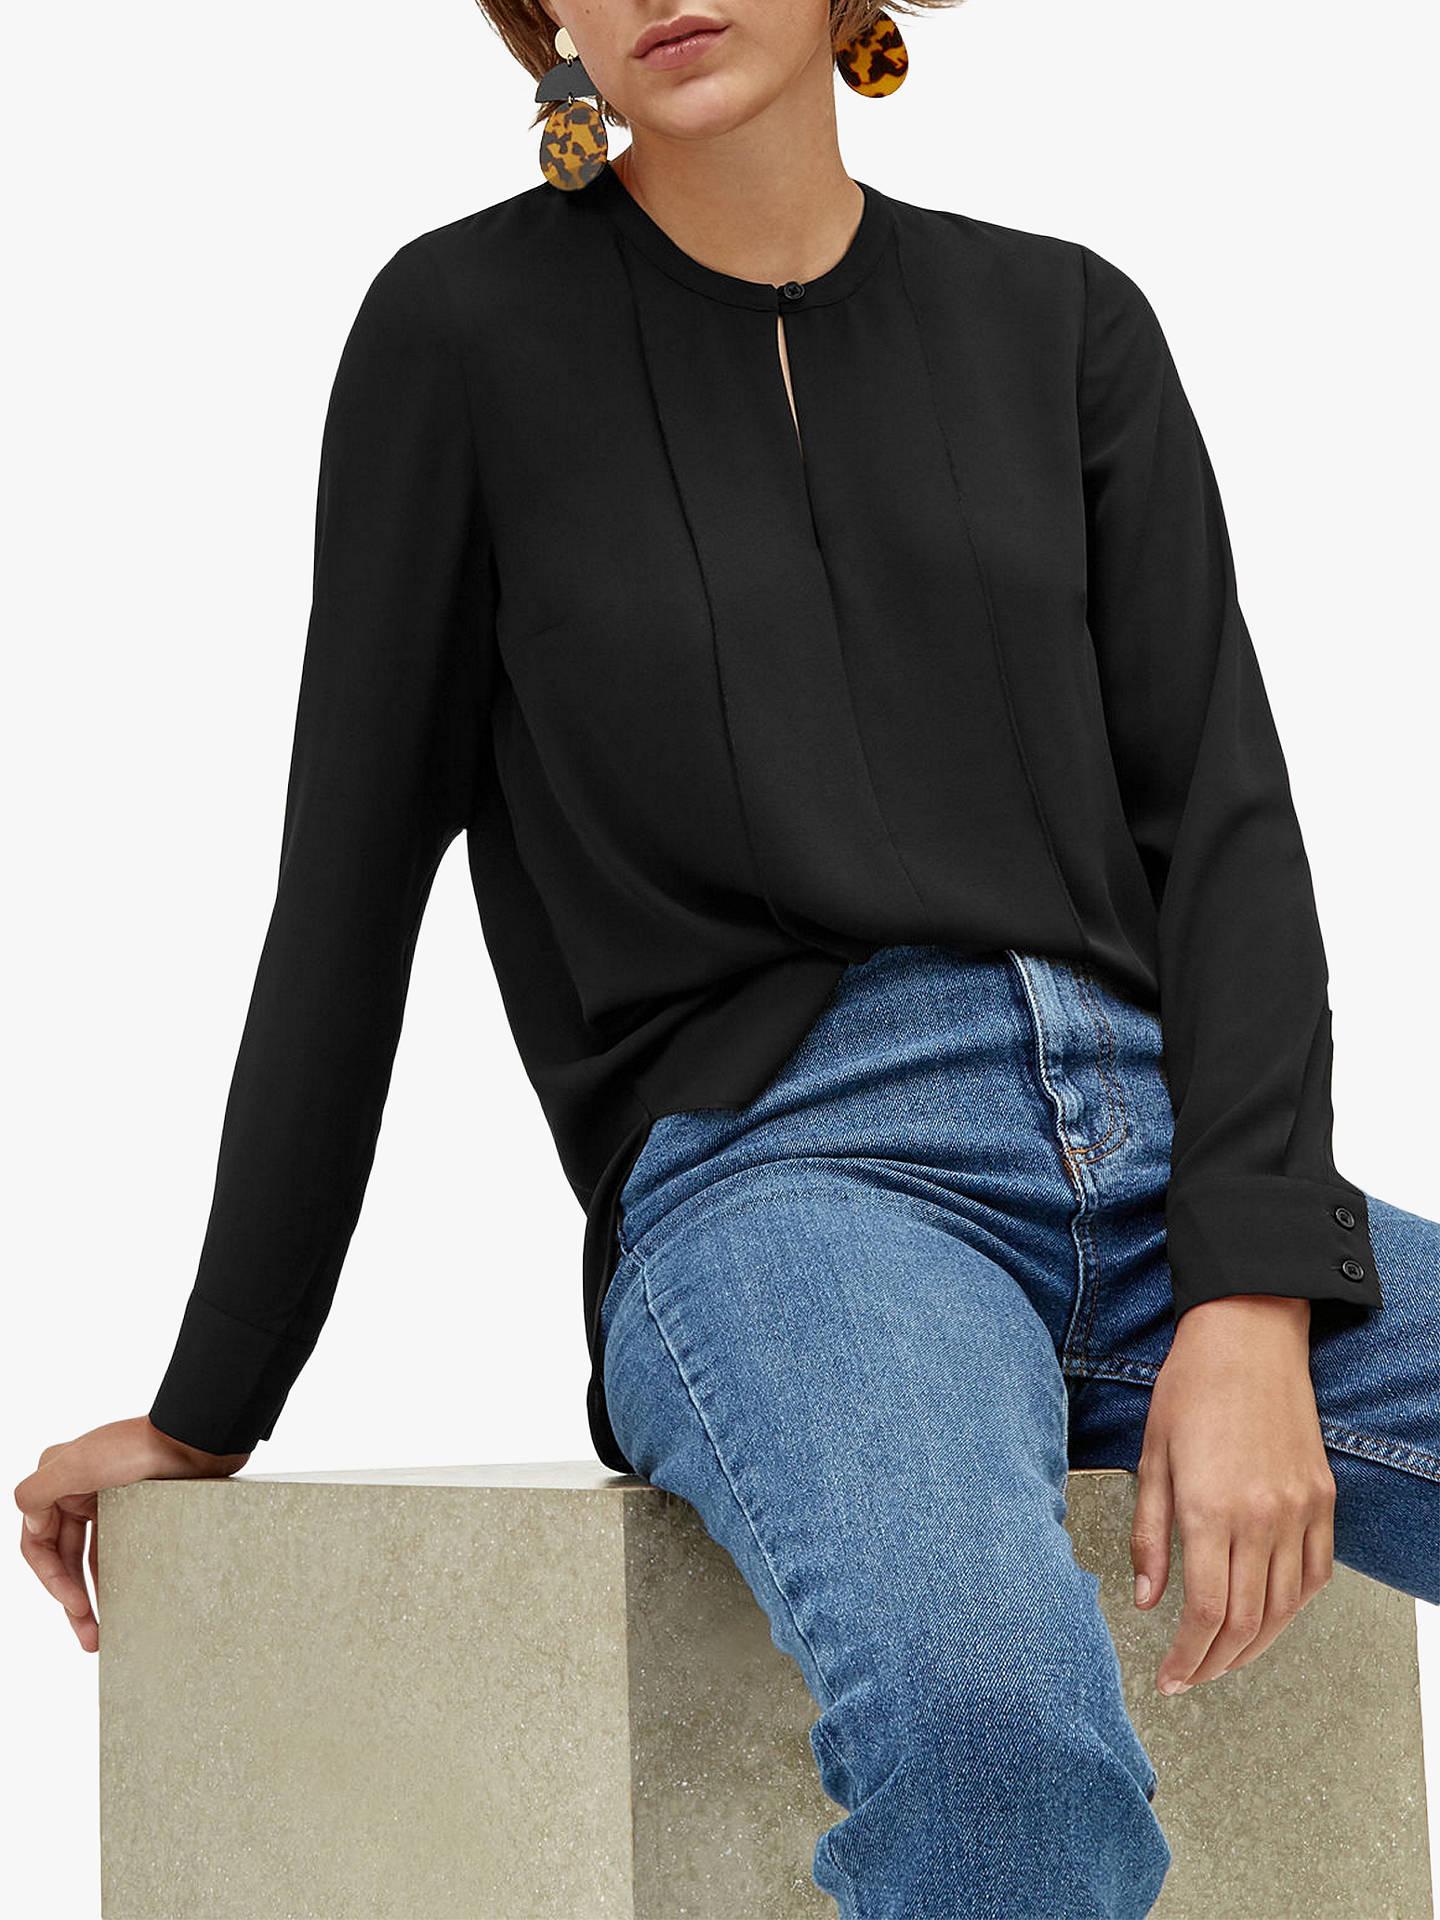 e0f07e5ebe0bf4 ... Buy Warehouse Plain Button Blouse, Black, 6 Online at johnlewis.com